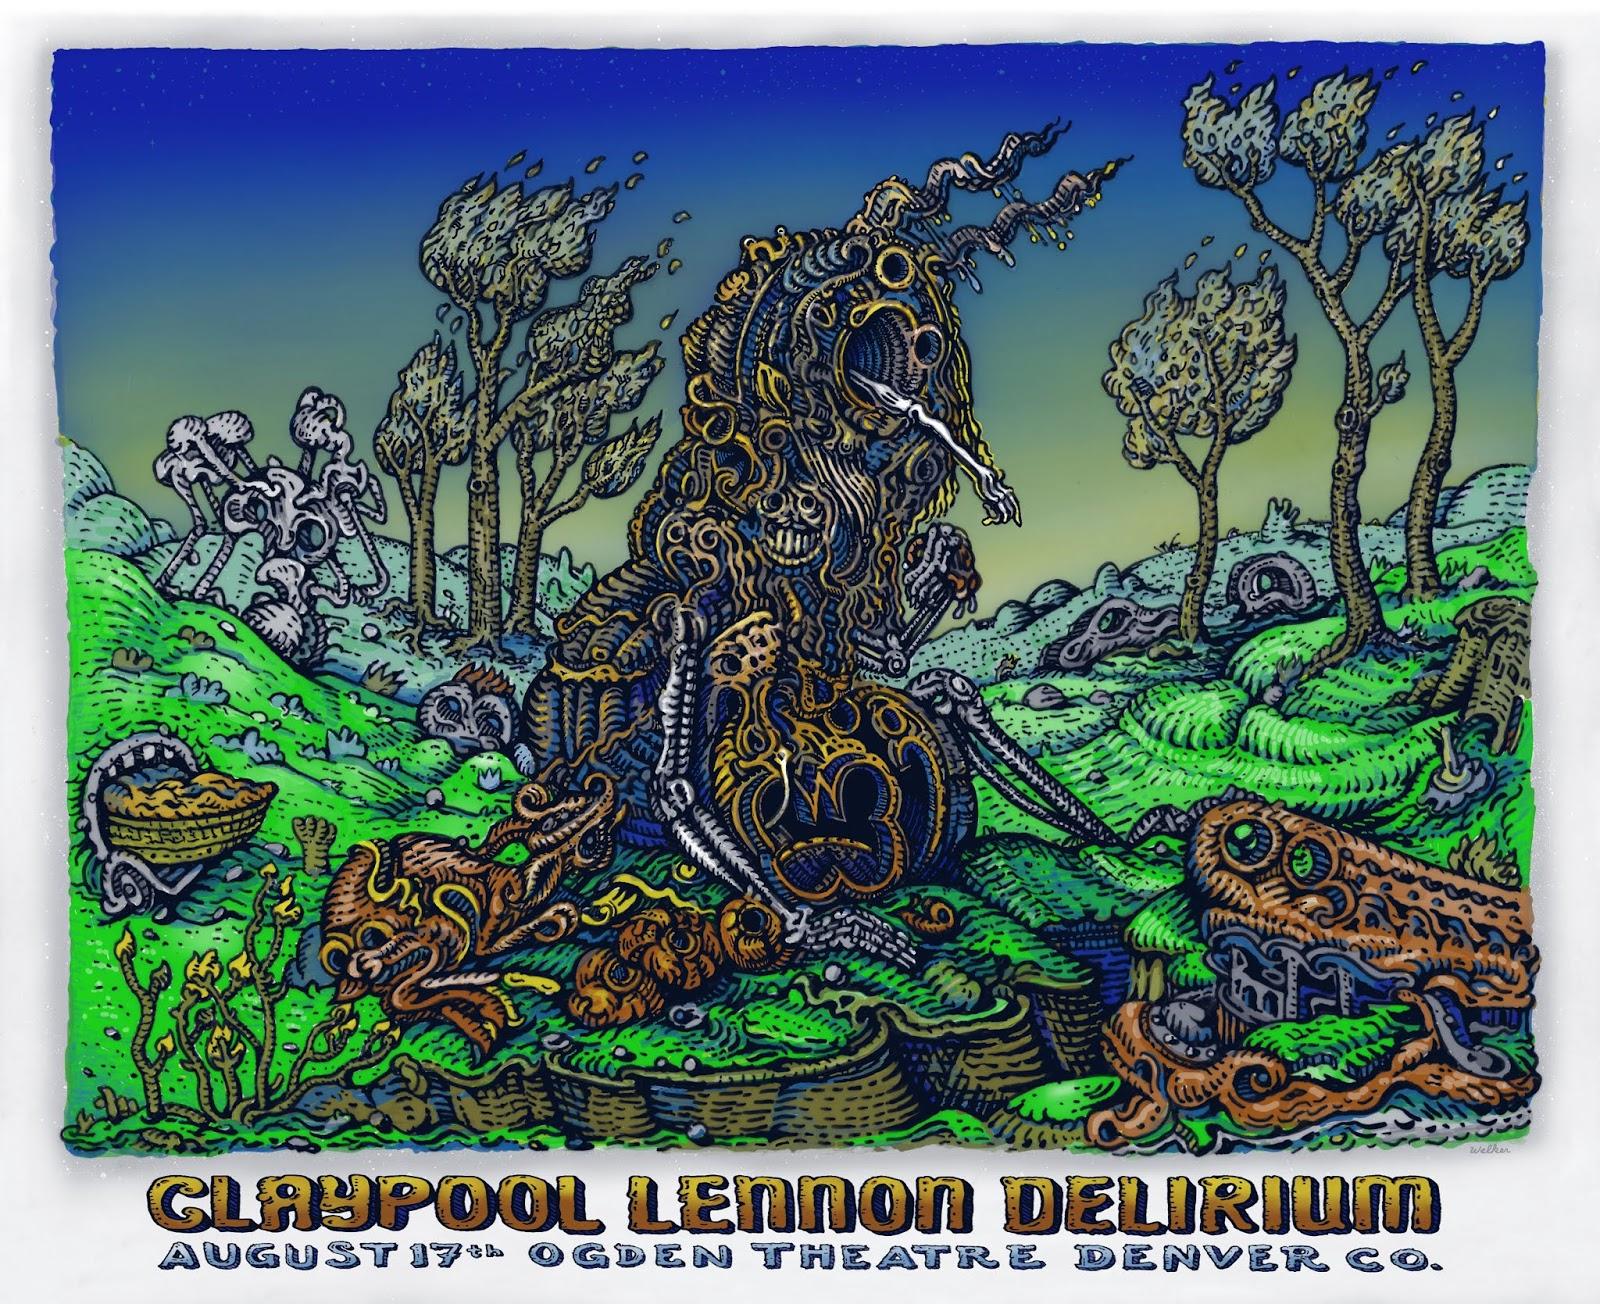 Claypool Lennon Ogden